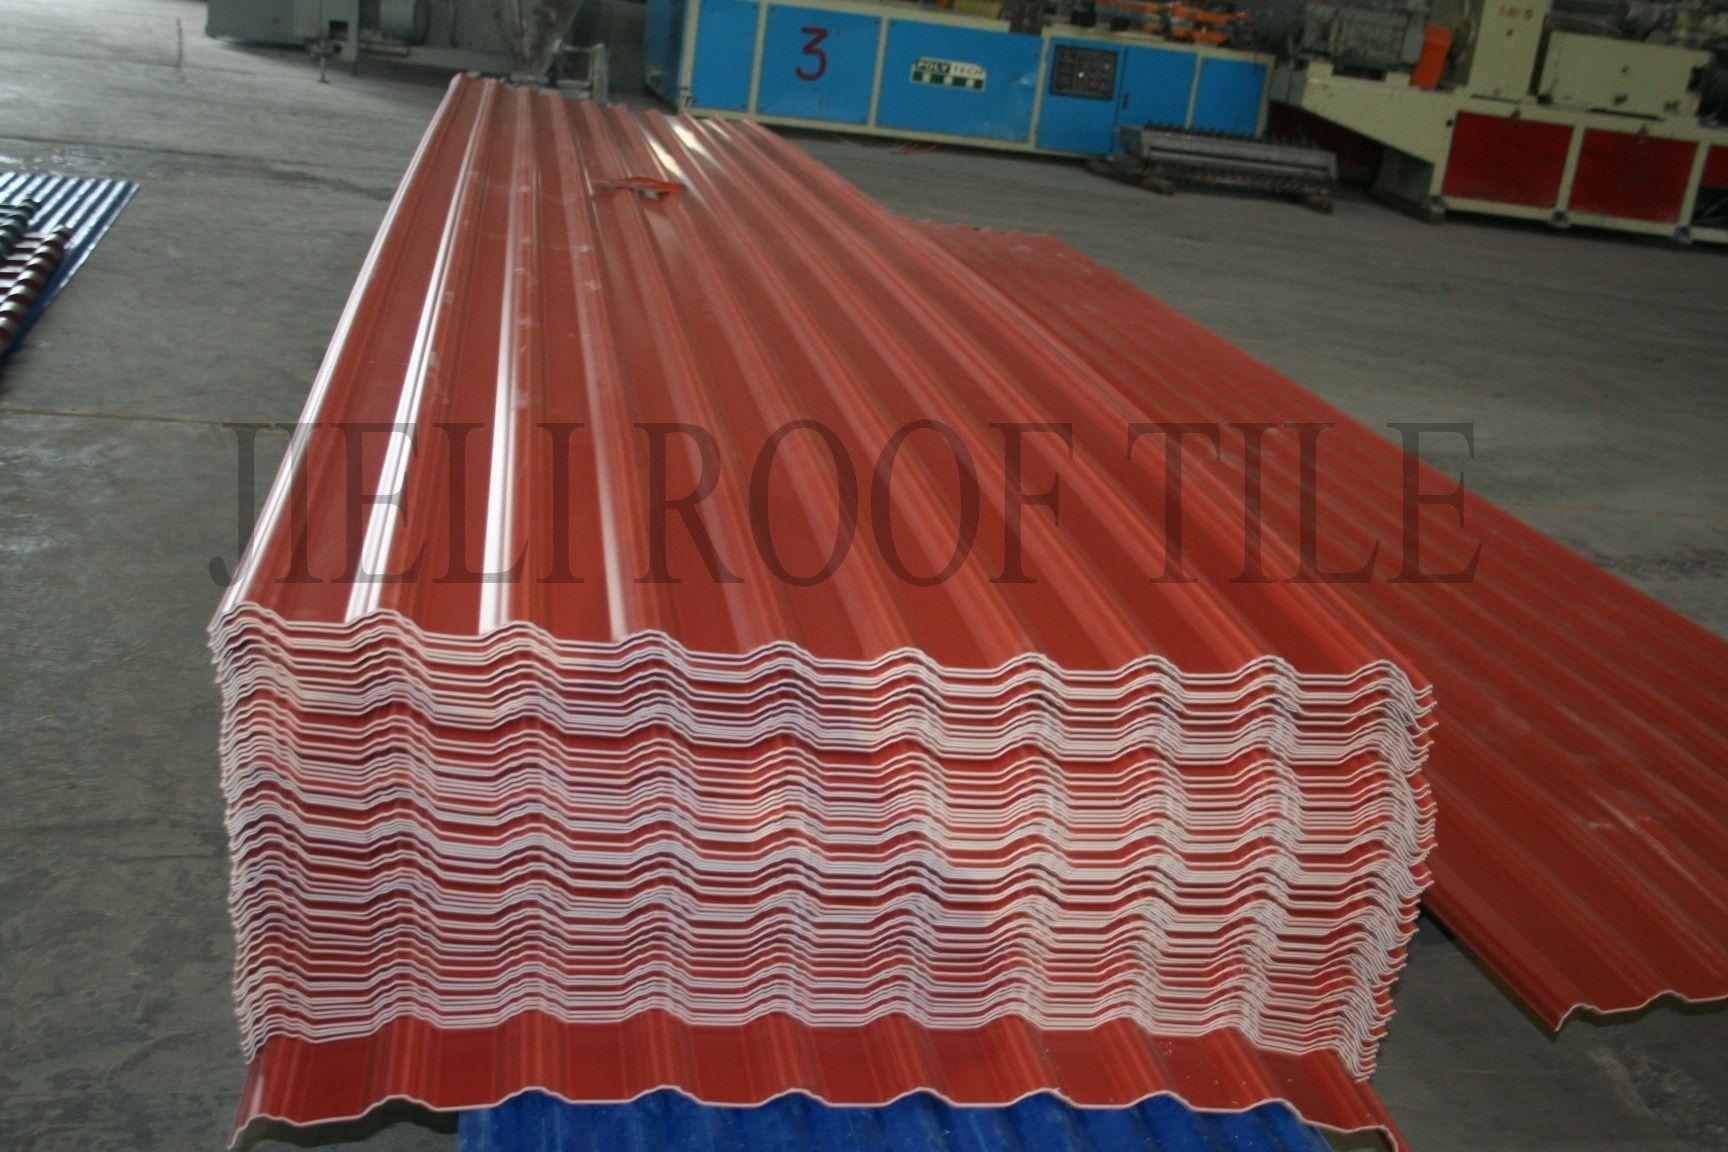 Composite Roofing / Corrugated   REINFORCED FIBERGLASS ROOF TILE 1130 WIDTH